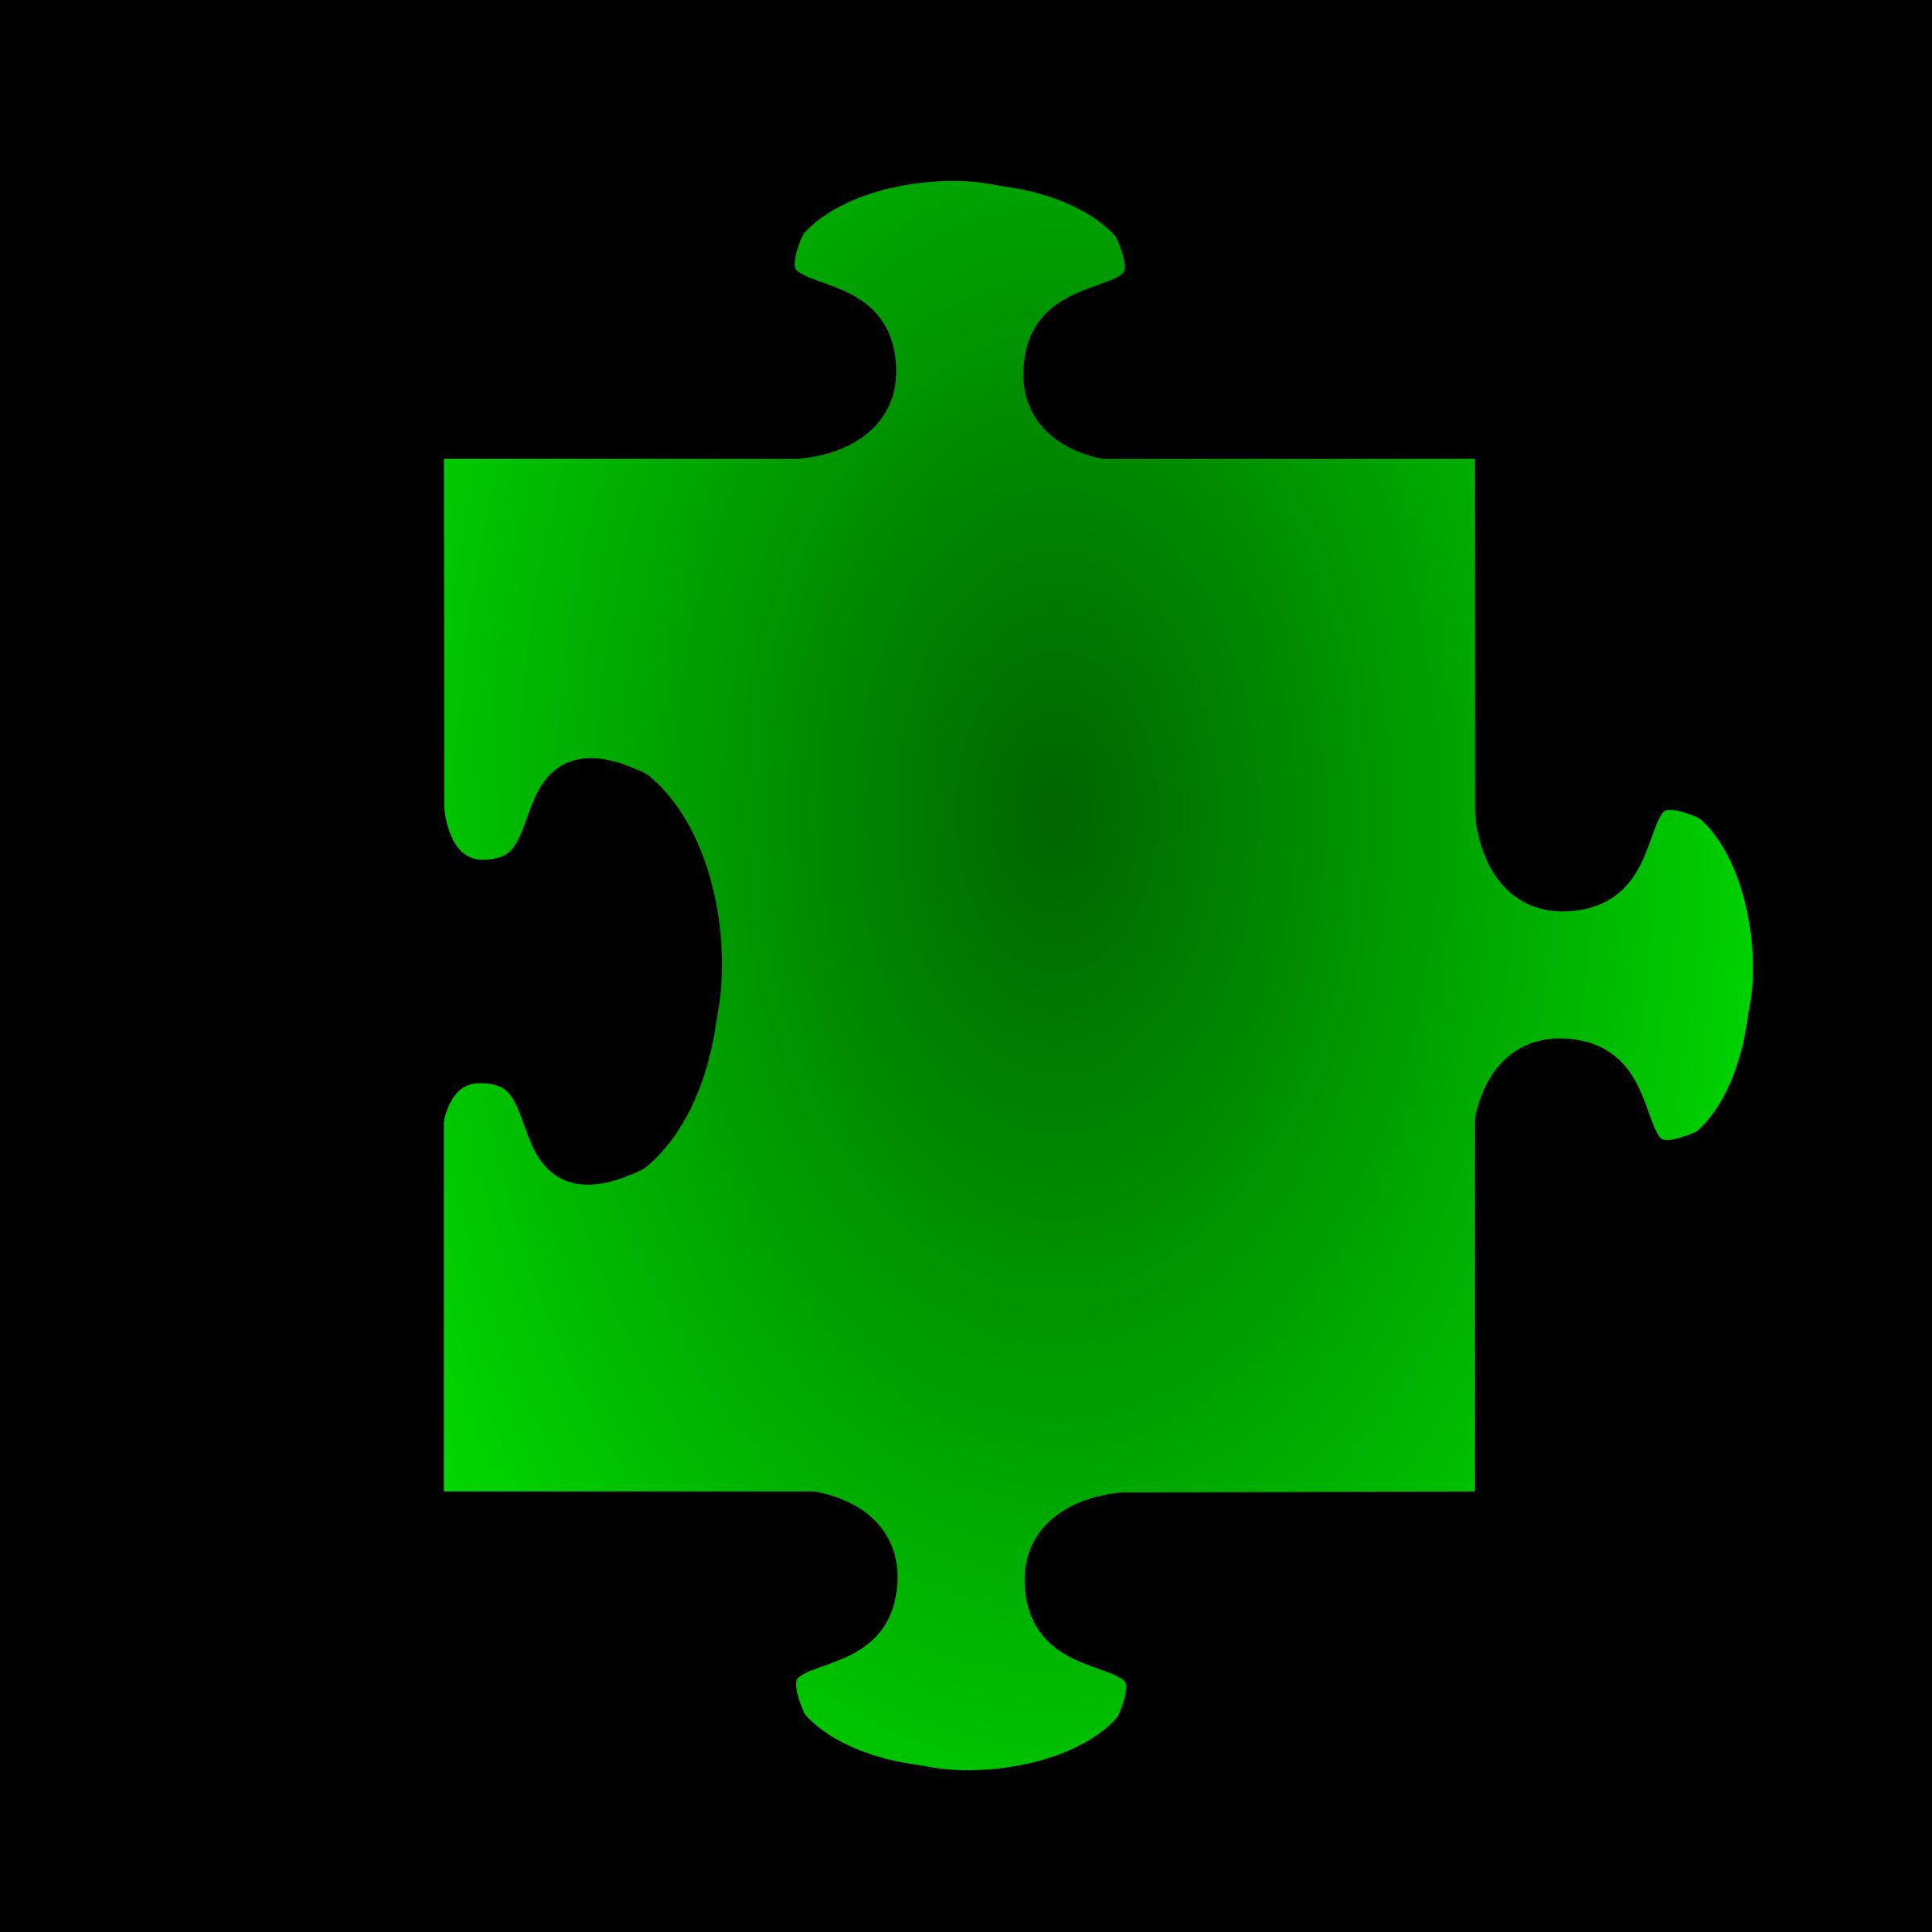 Puzzle clipart border. Panda free images jigsawclipart